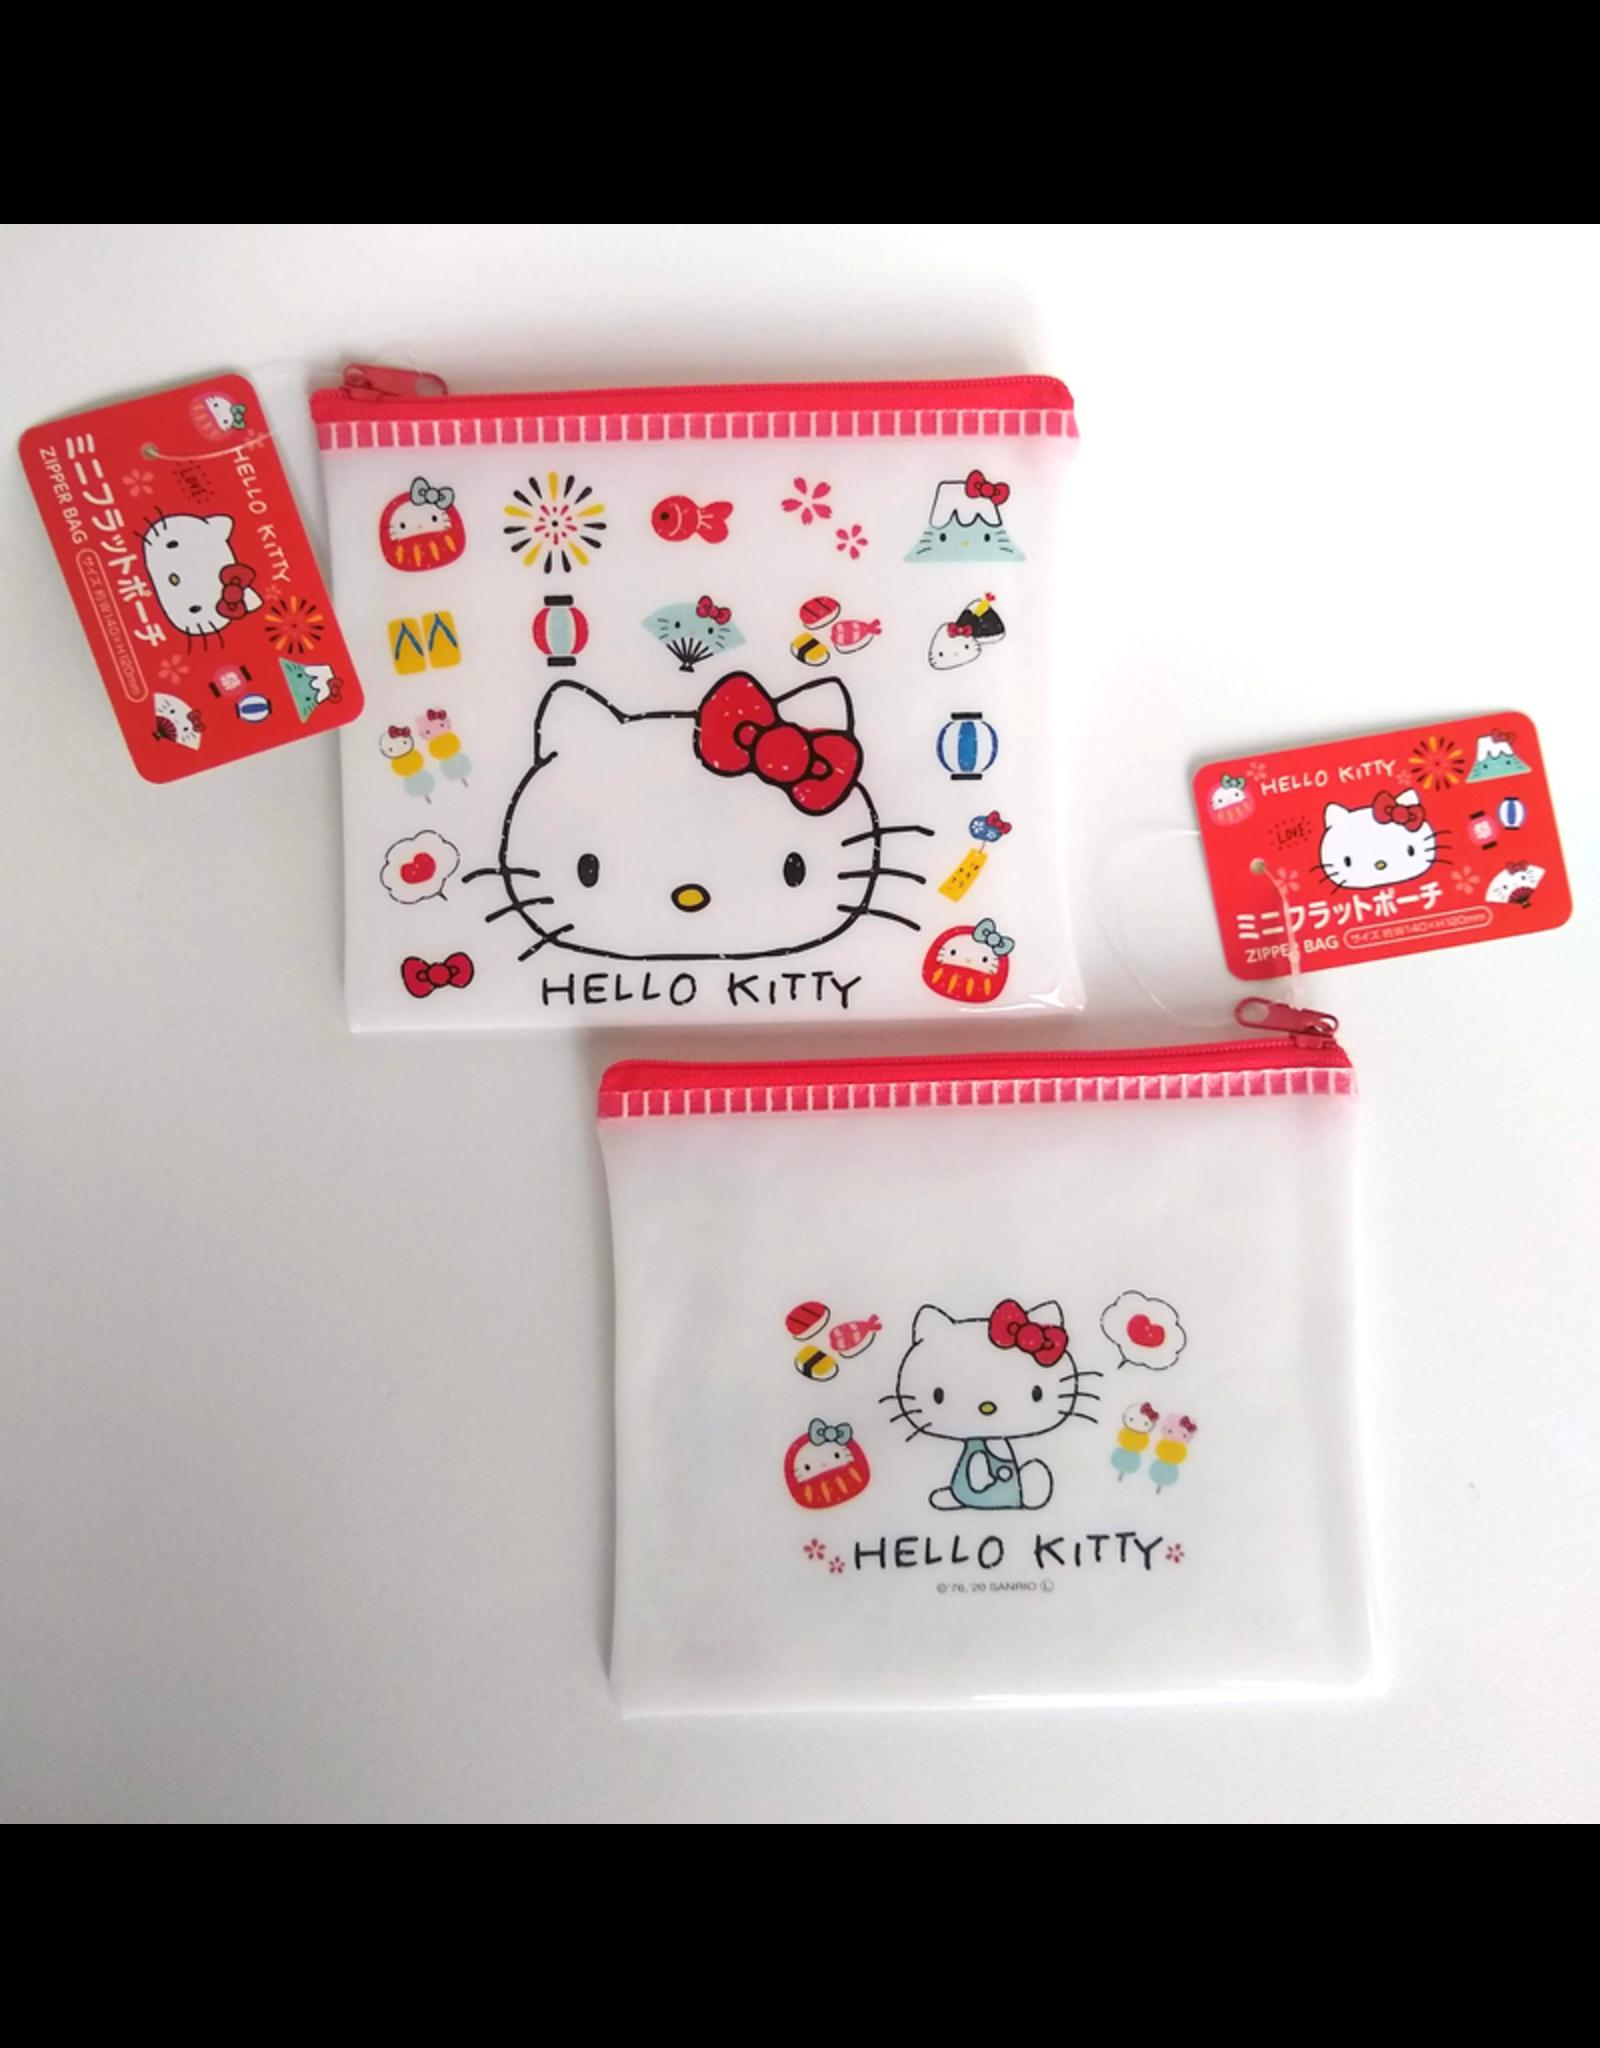 Hello Kitty - Zipper Bag - 14 x 12 cm